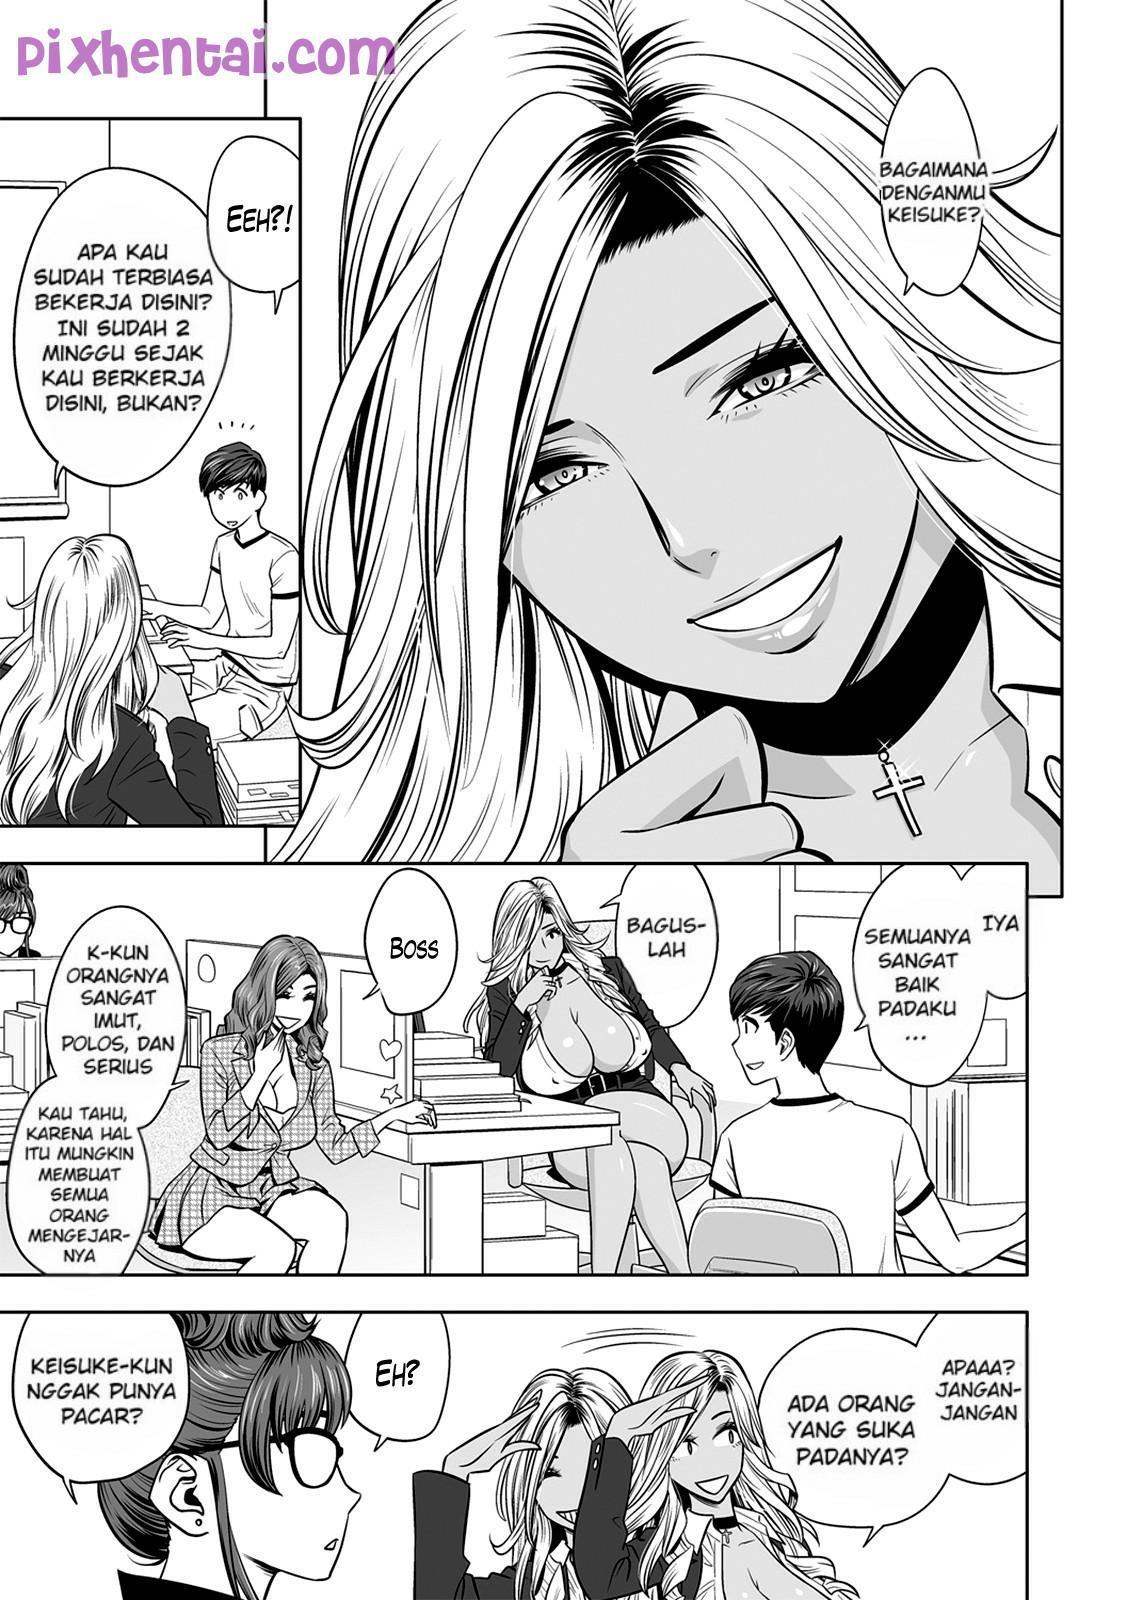 Komik Hentai Diajak Ngesex Direktur Montok Manga XXX Porn Doujin Sex Bokep 12